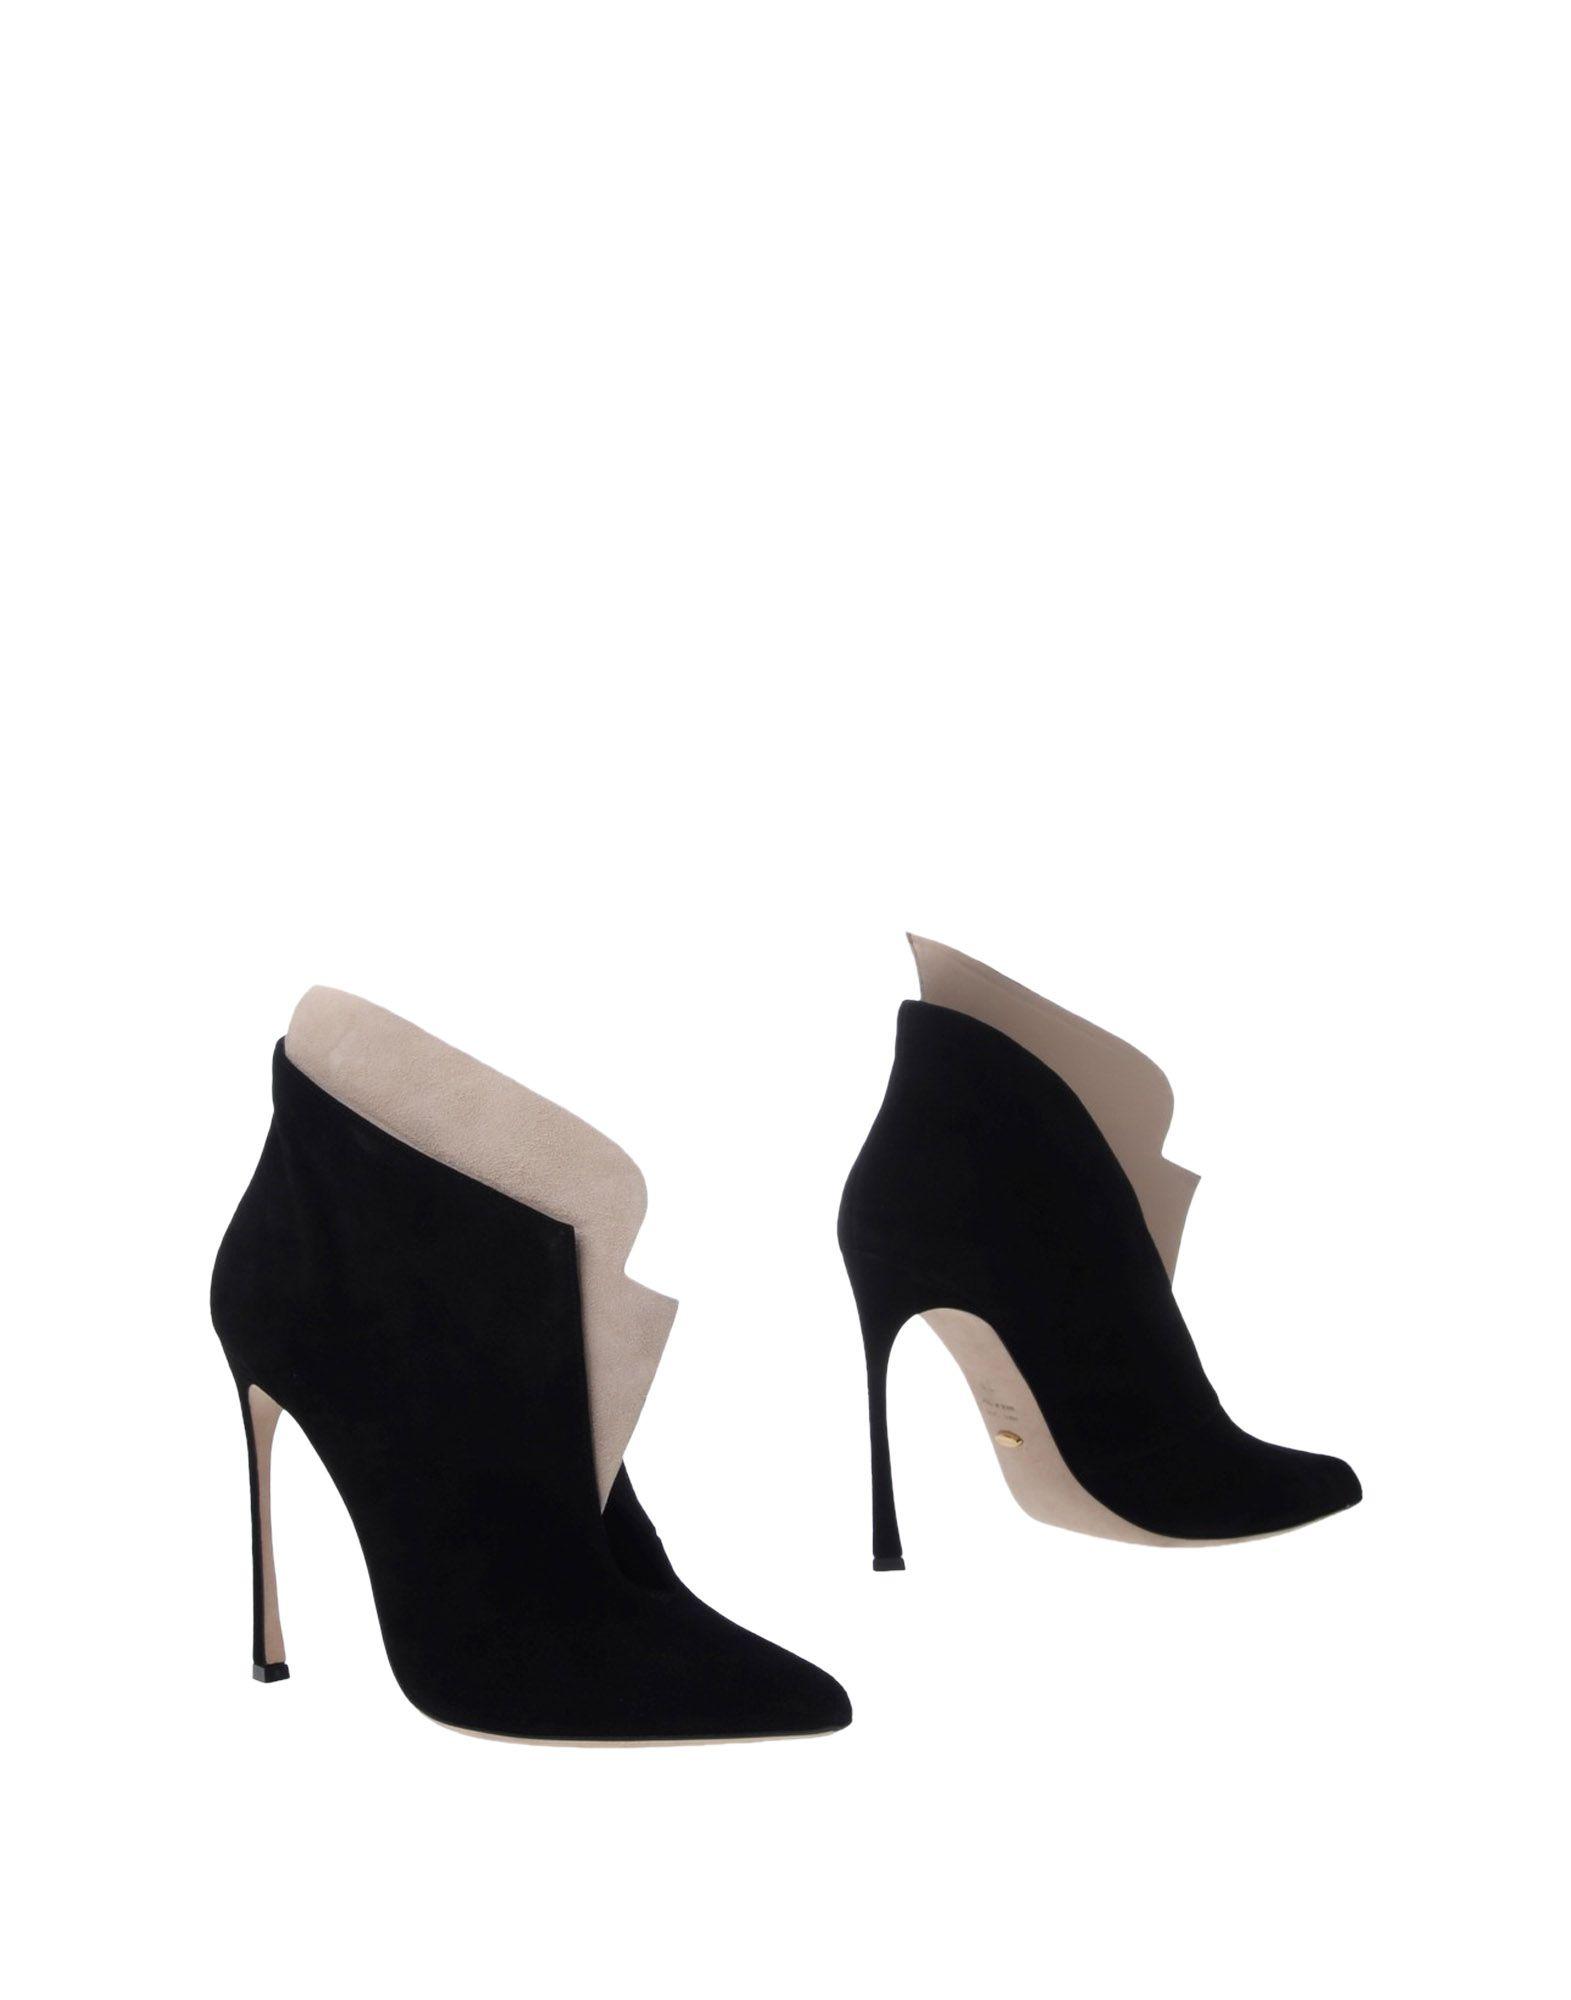 Sergio Rossi Stiefelette Damen  11284874IM Neue Schuhe